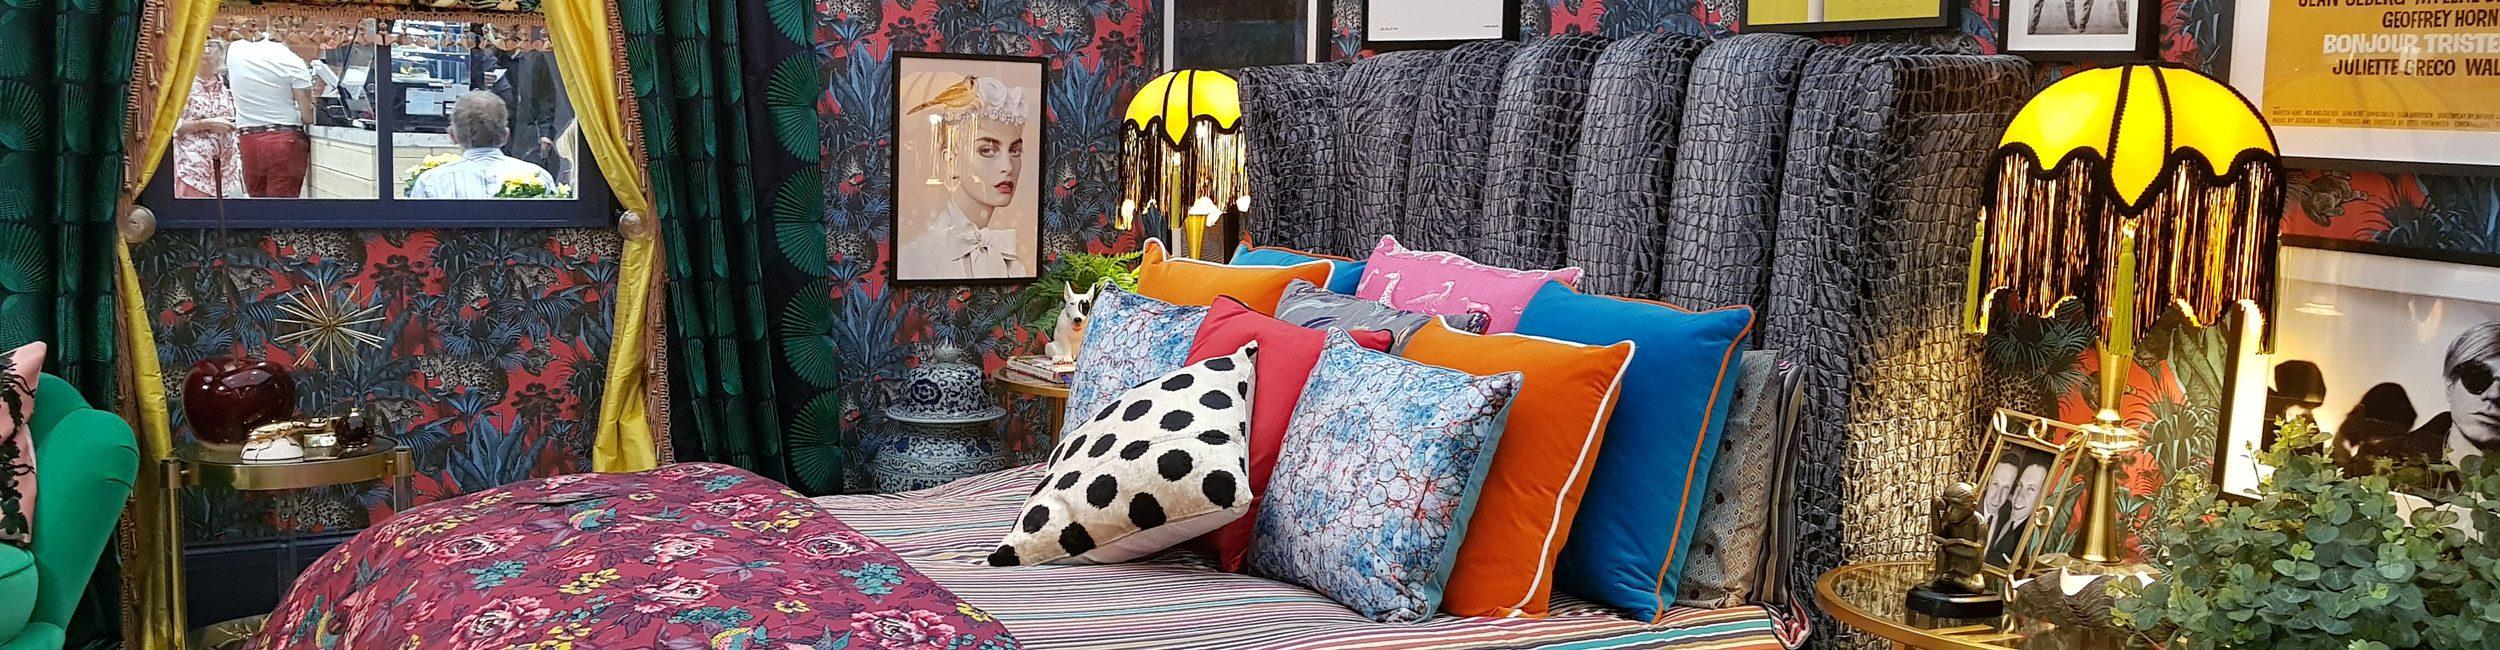 Enaflo's May Round-Up - Enaflo Interiors